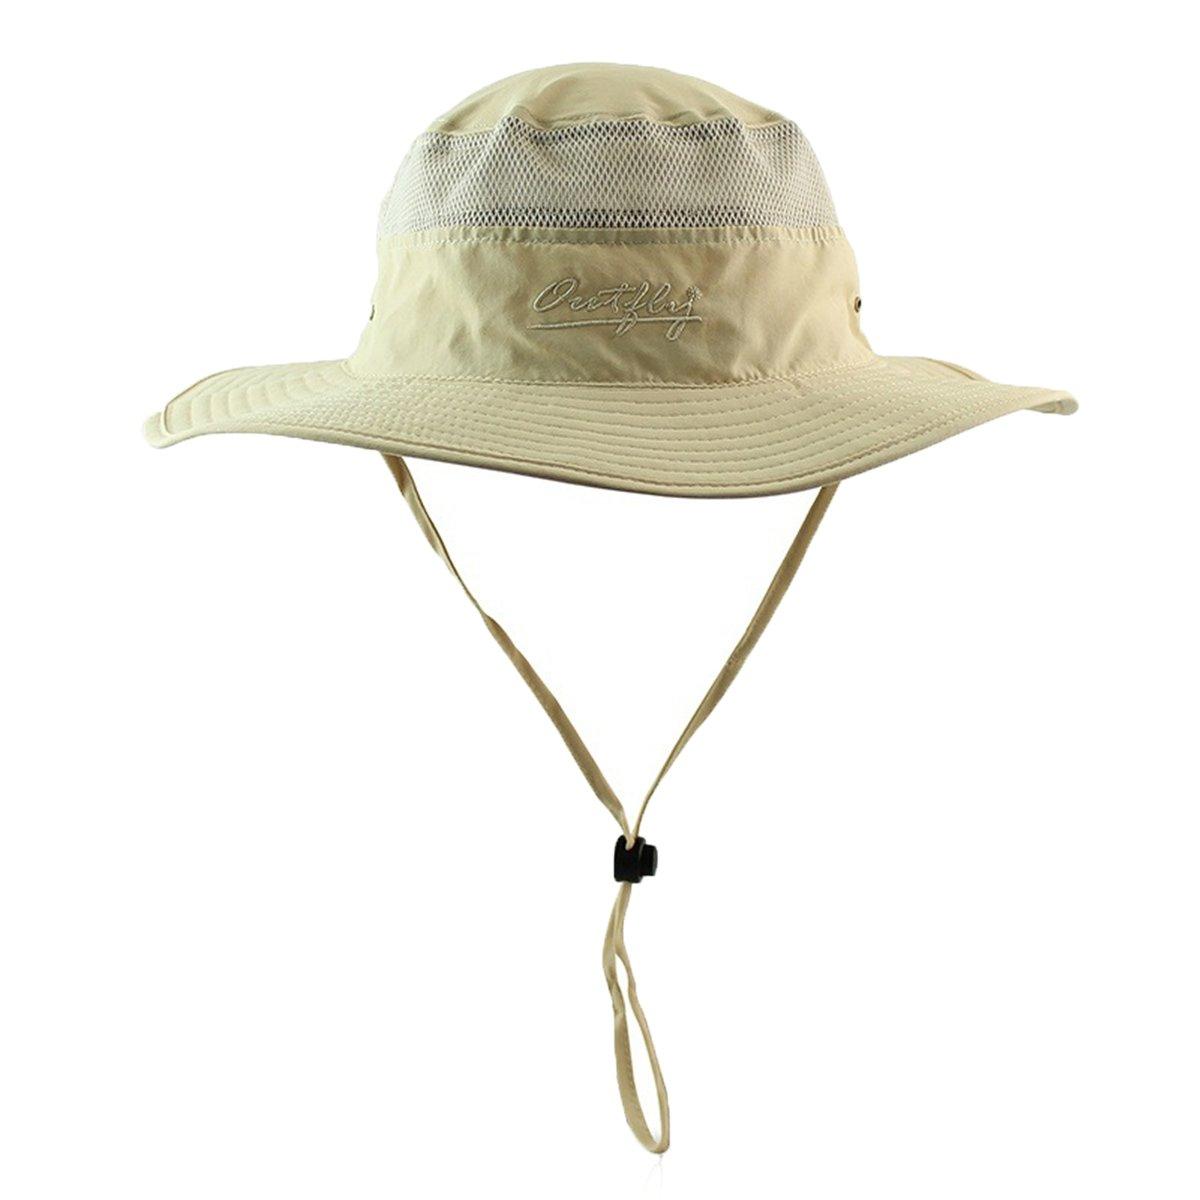 Apparelsales Women's Men's Sun Hat Fishing Cap Net Quick-dry Hat QLFA CA20151226-1